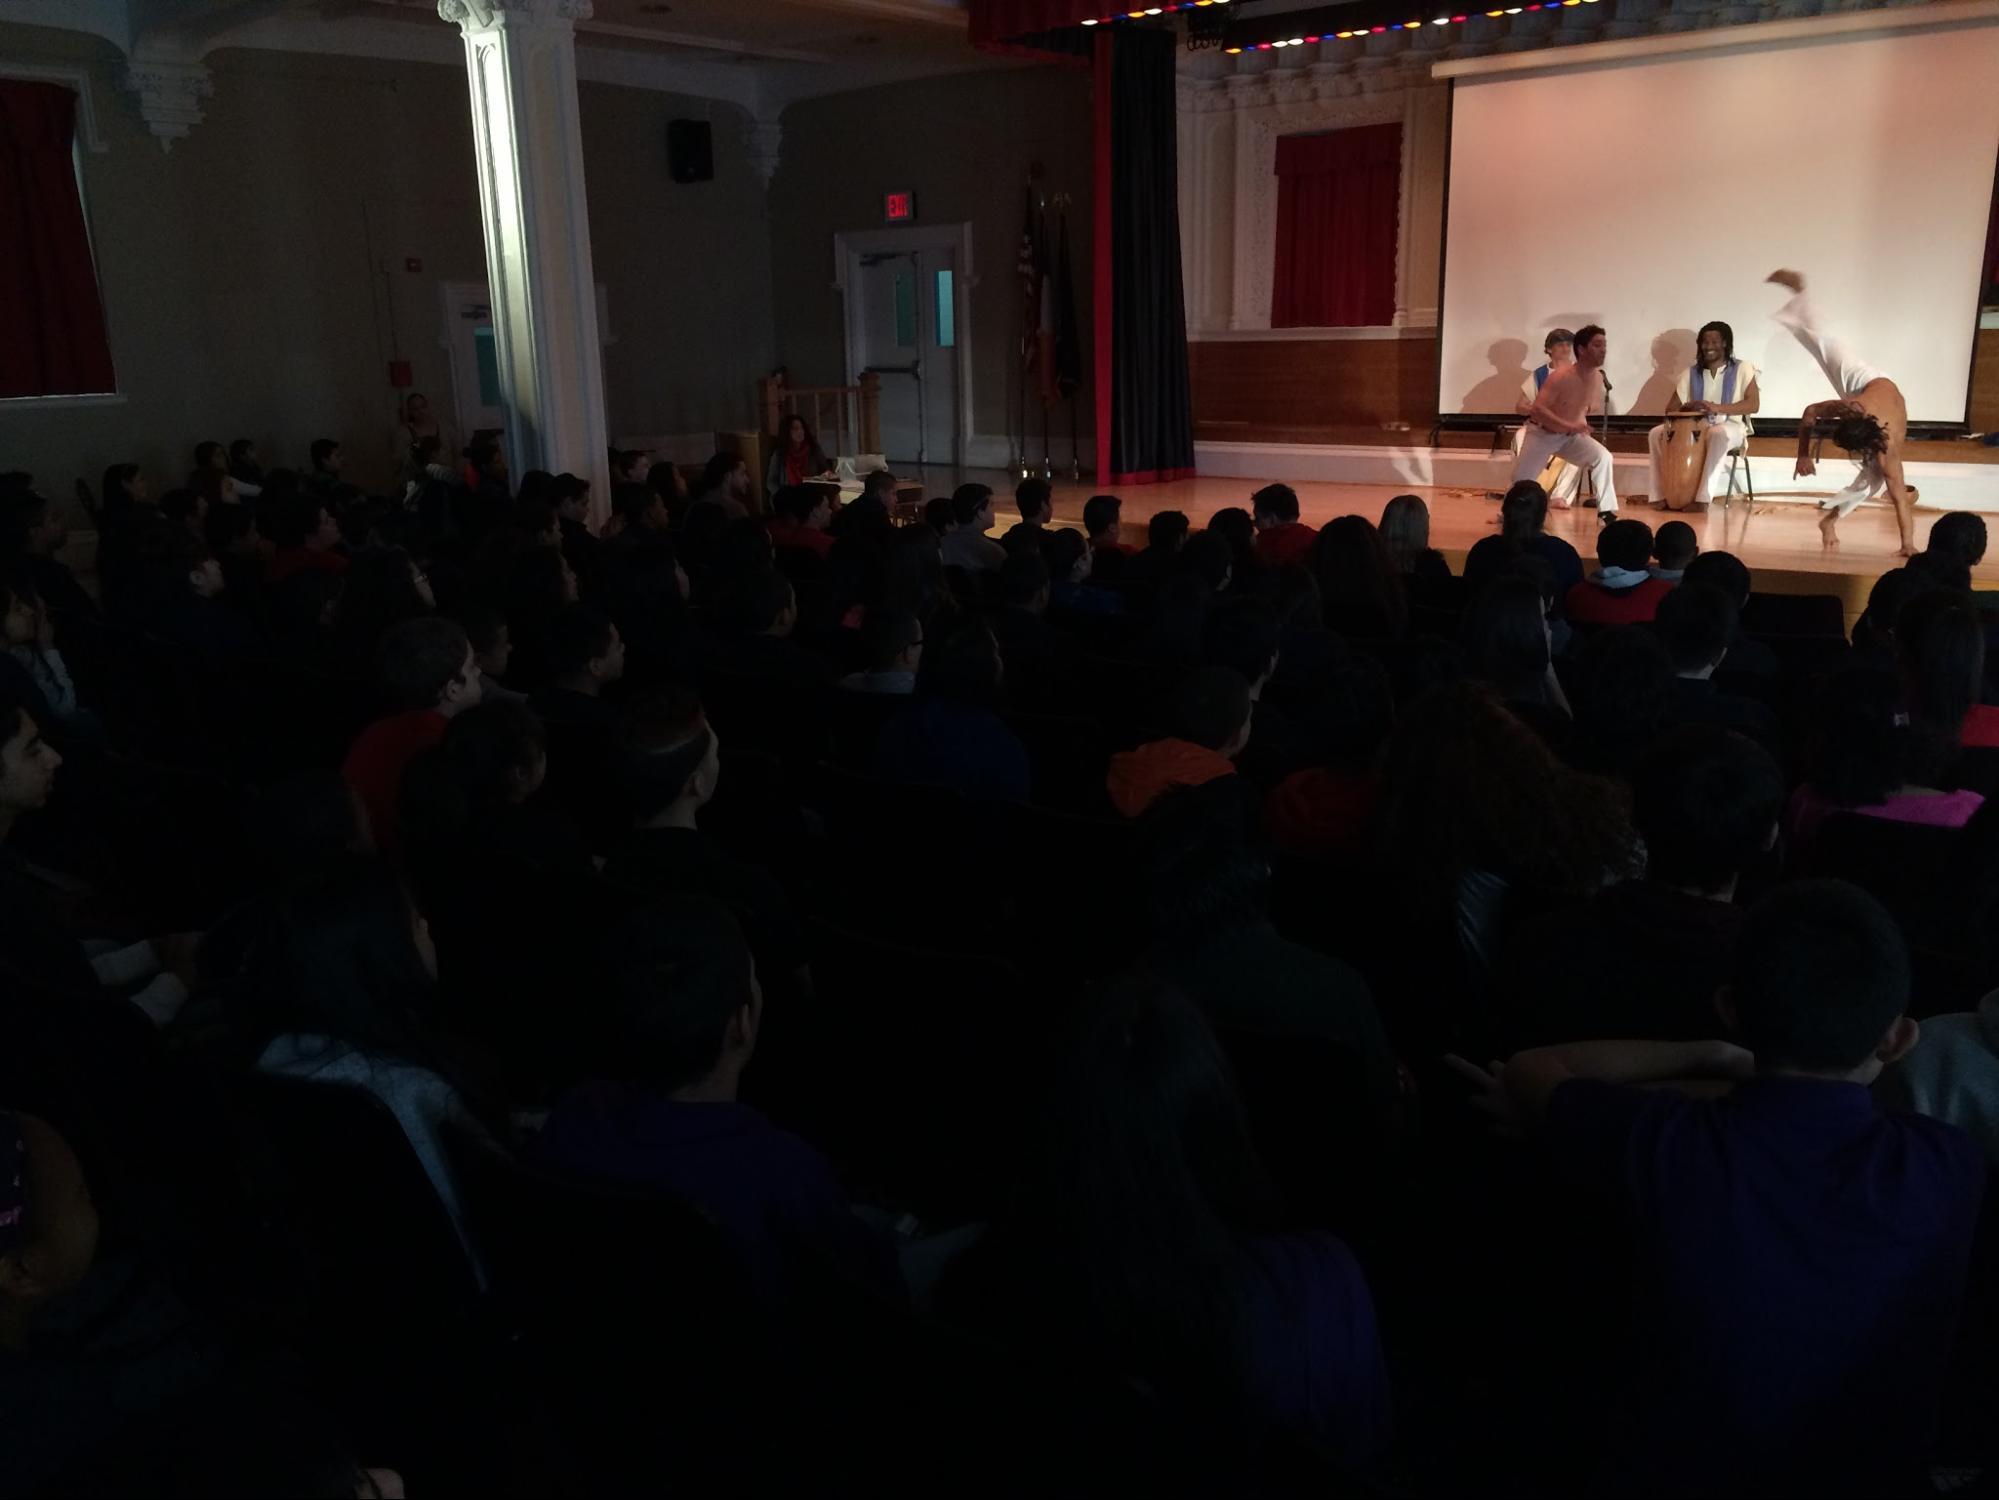 Capoeiristas astound their audience through dance, martial arts, and music.